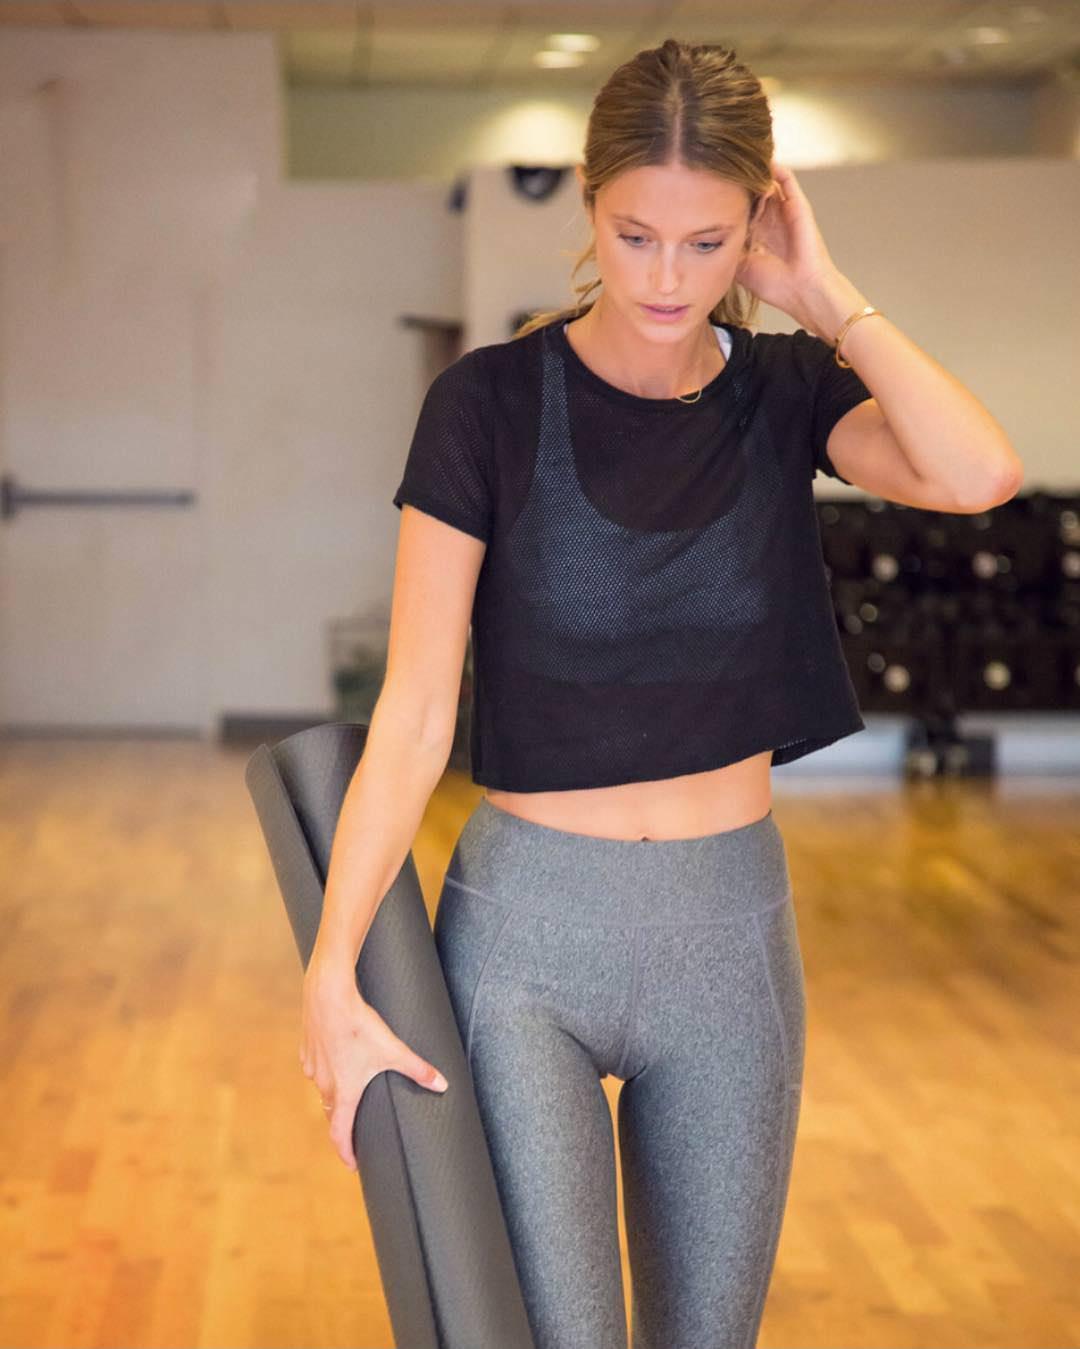 kate-bock-workout-camel-toe